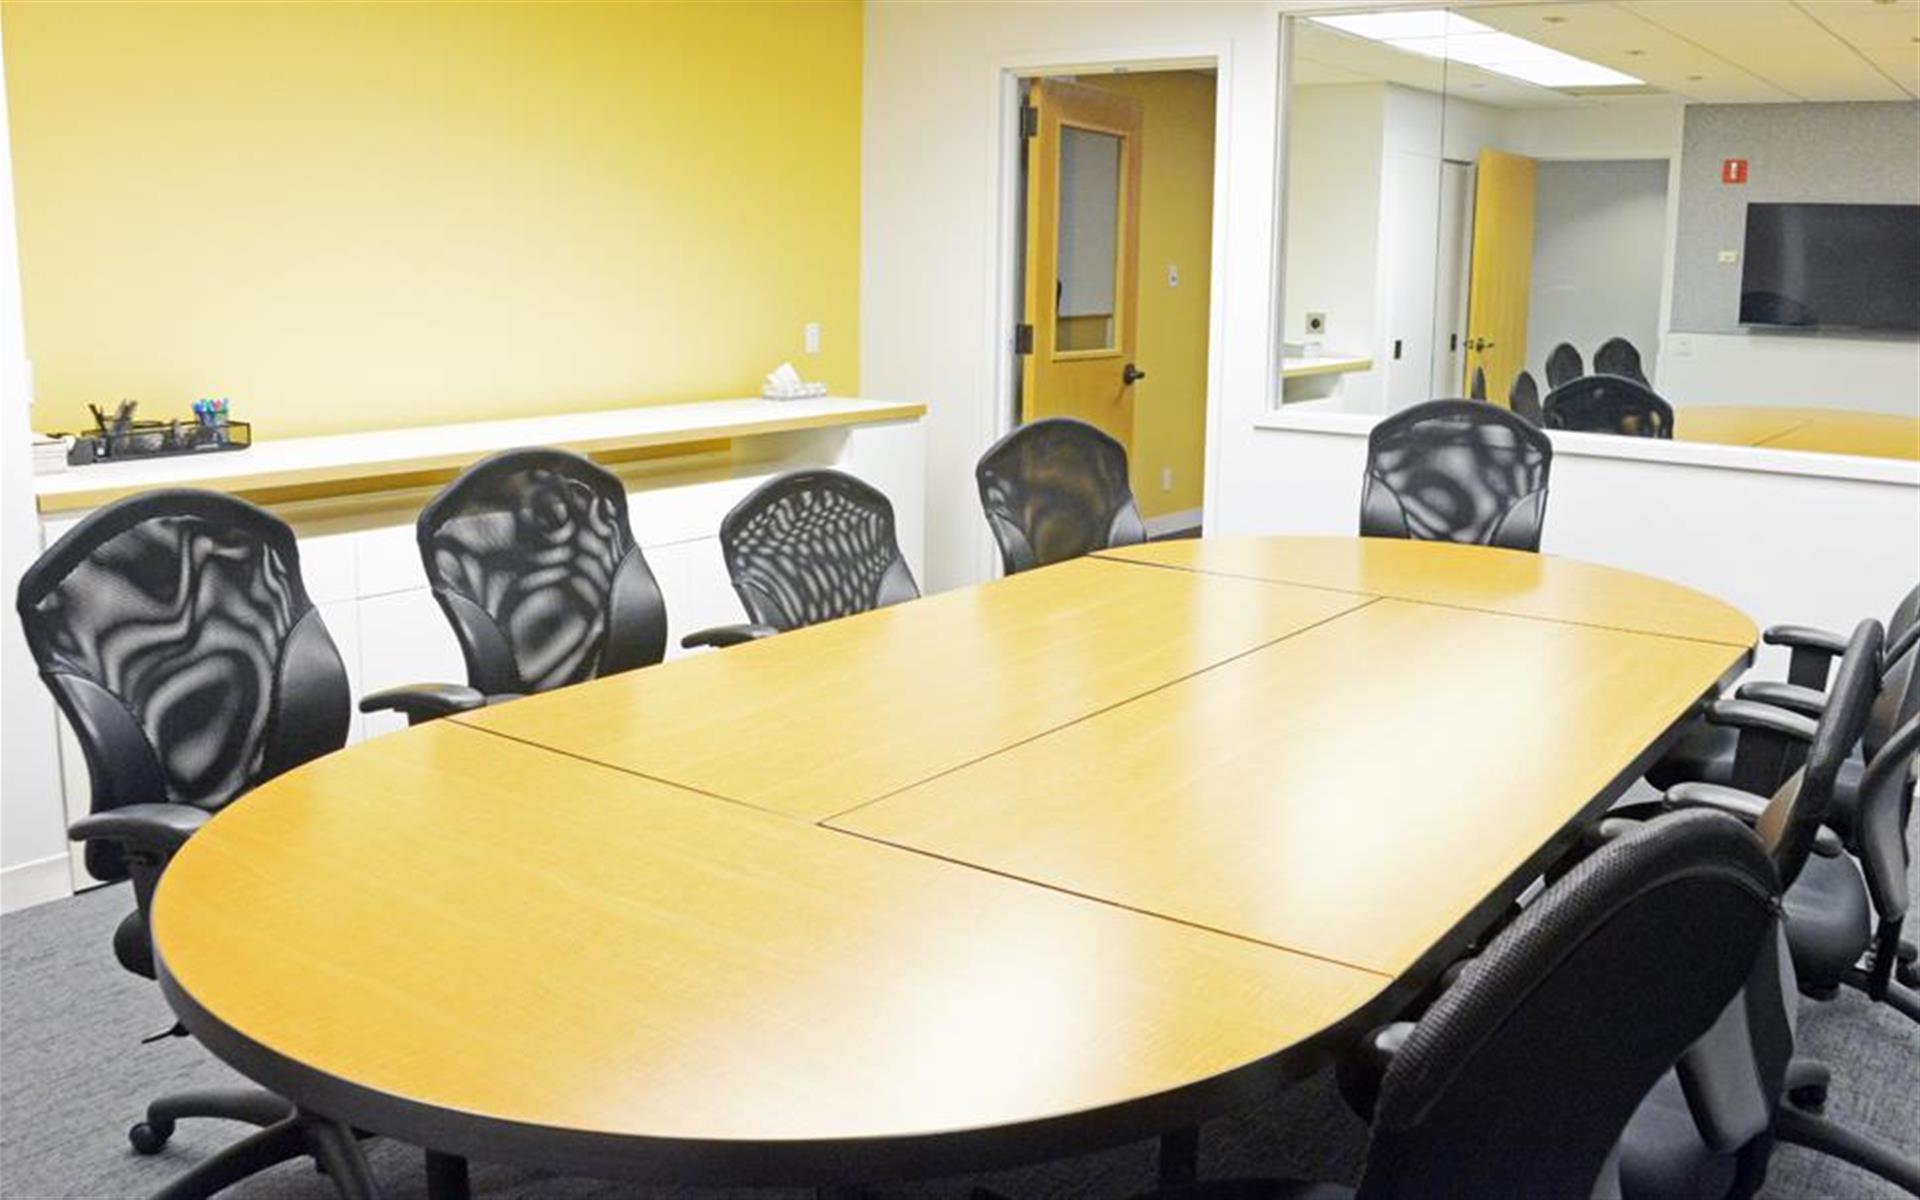 Focus Suites of Philadelphia - Yellow Room Suite